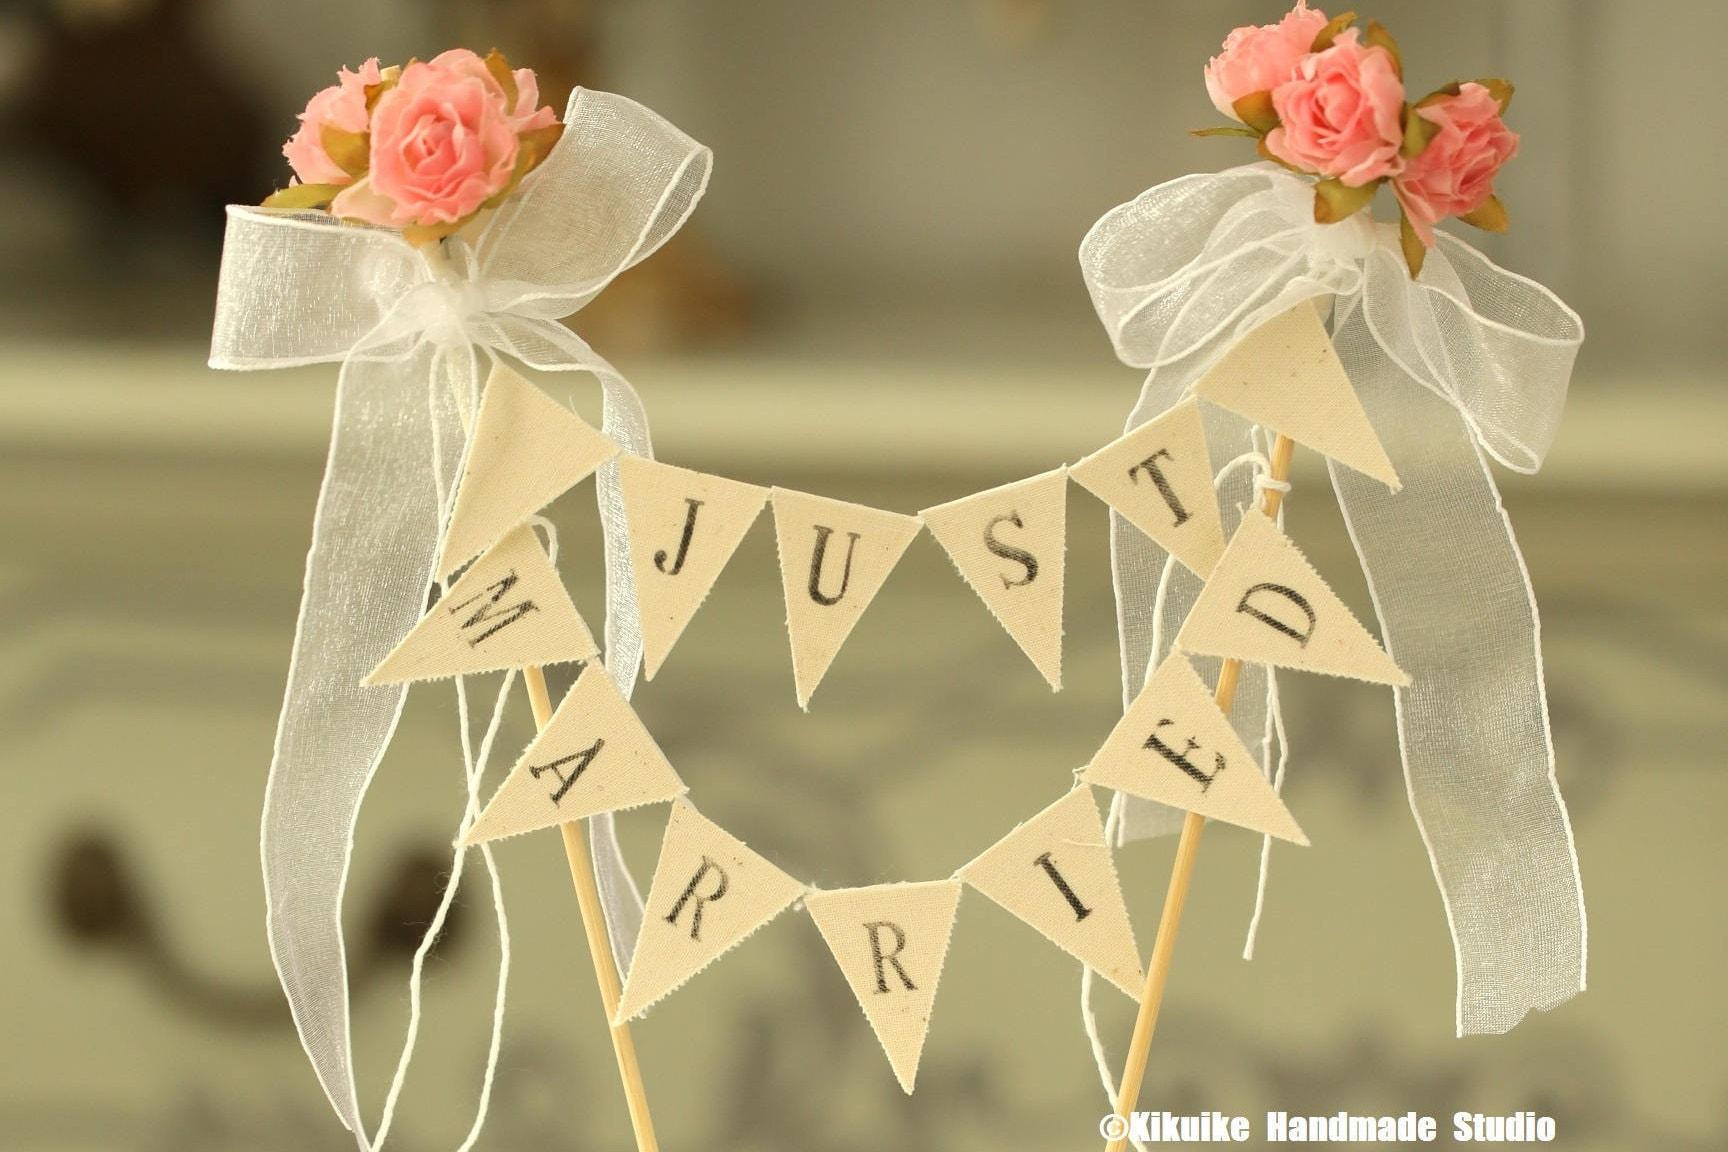 Just Married Wedding Cake Banner,Flower Cake bunting,Rustic Wedding ...